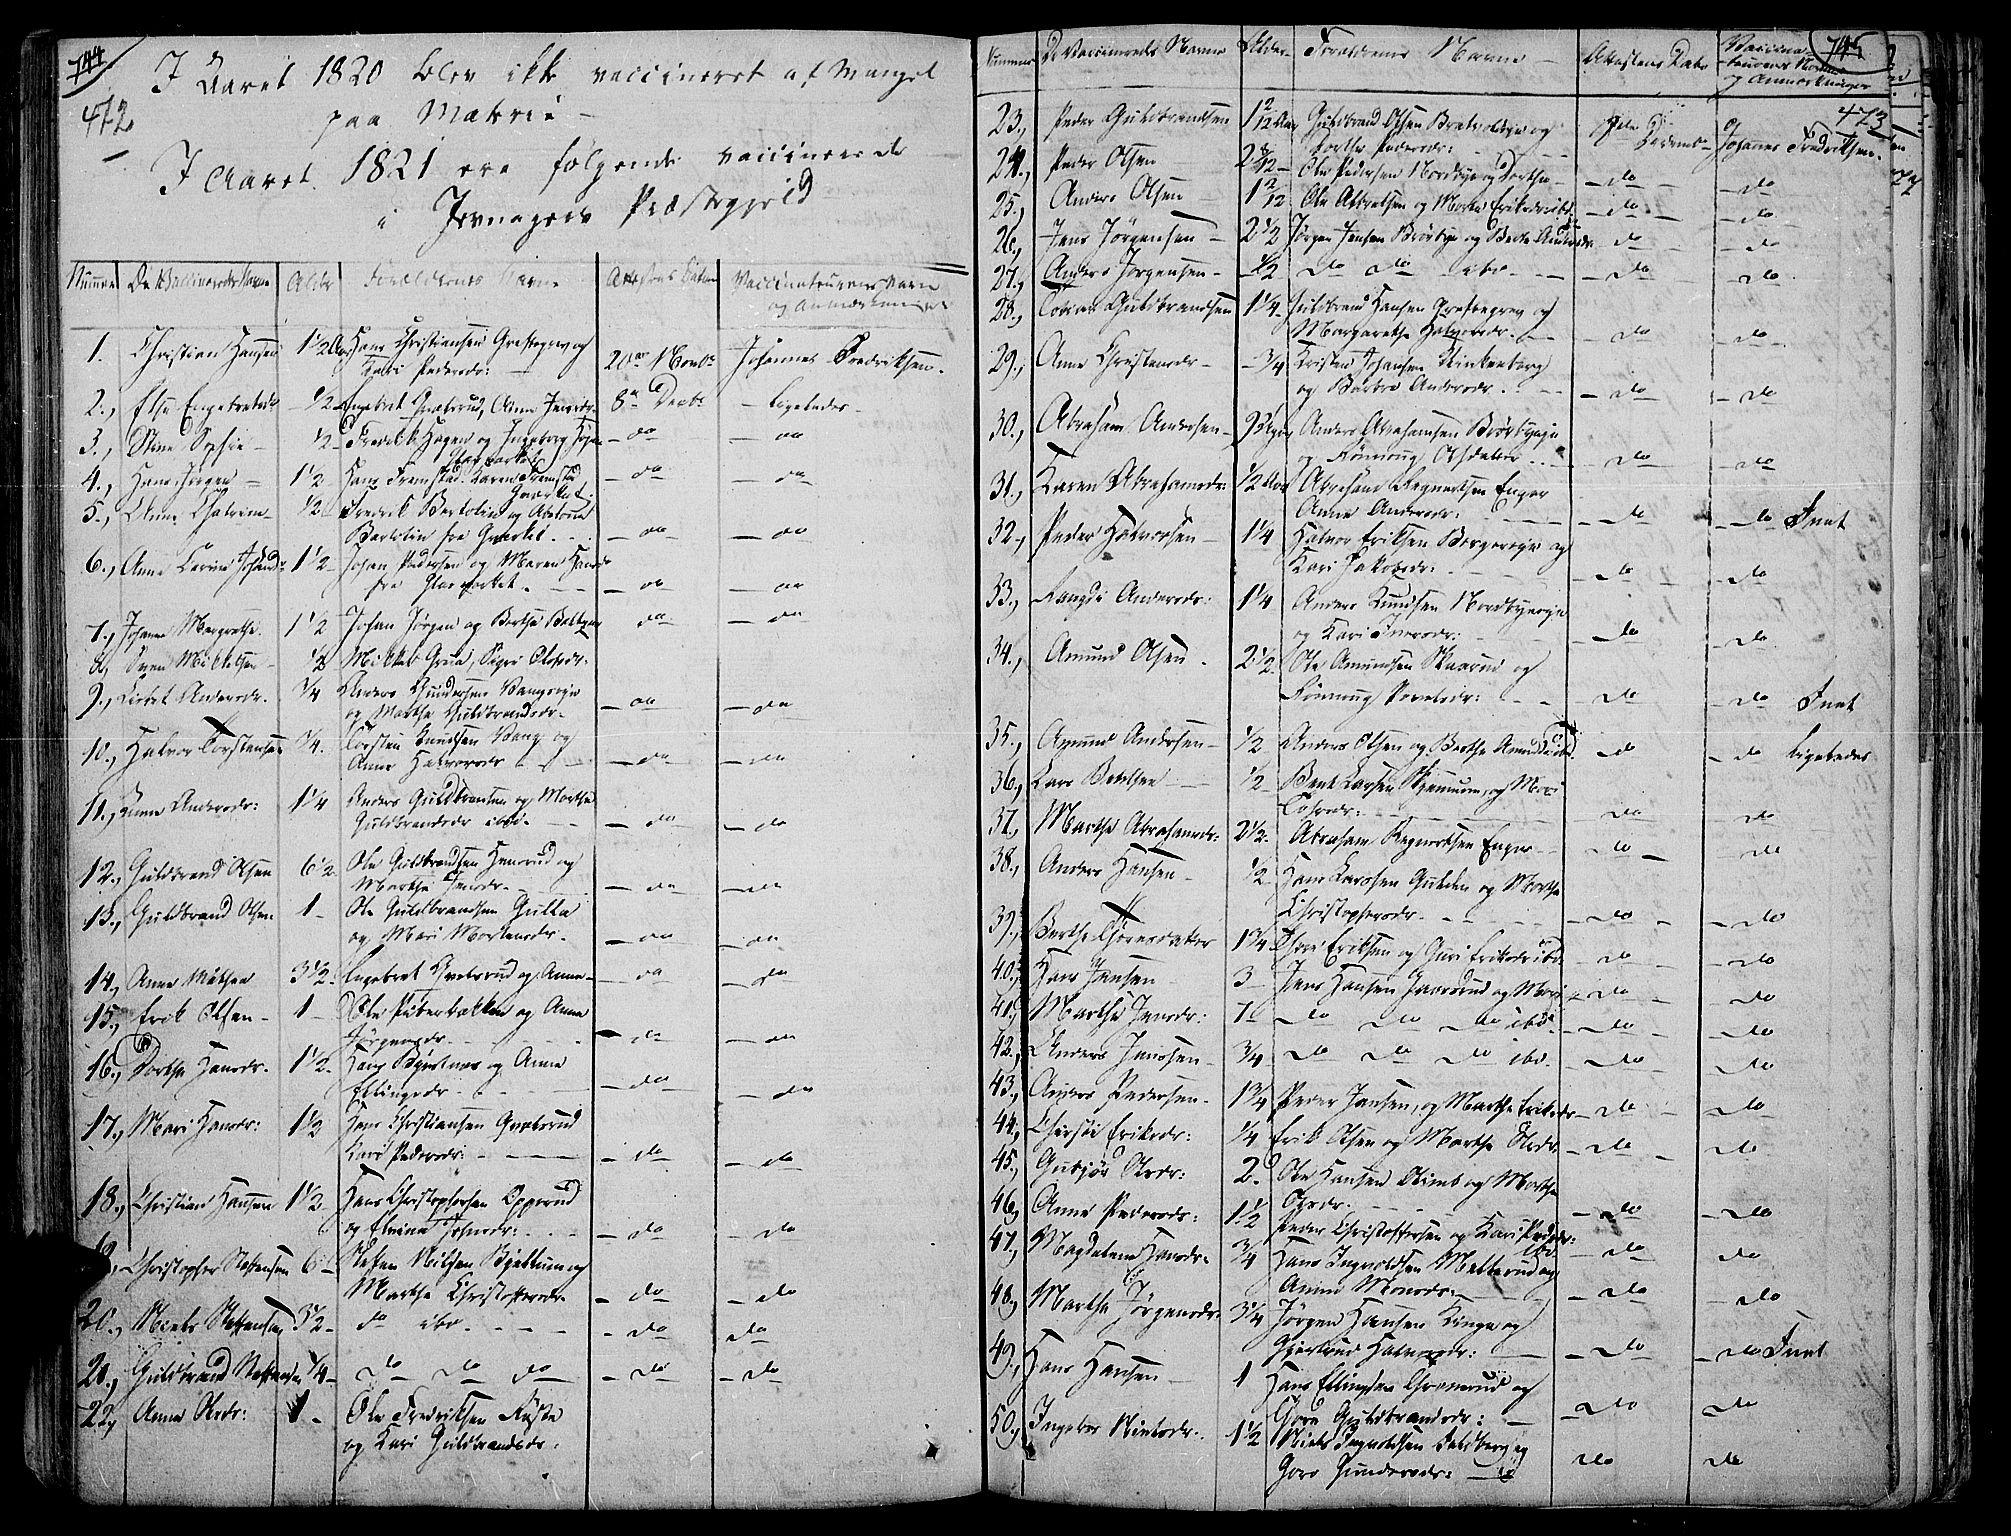 SAH, Jevnaker prestekontor, Ministerialbok nr. 4, 1800-1861, s. 472-473